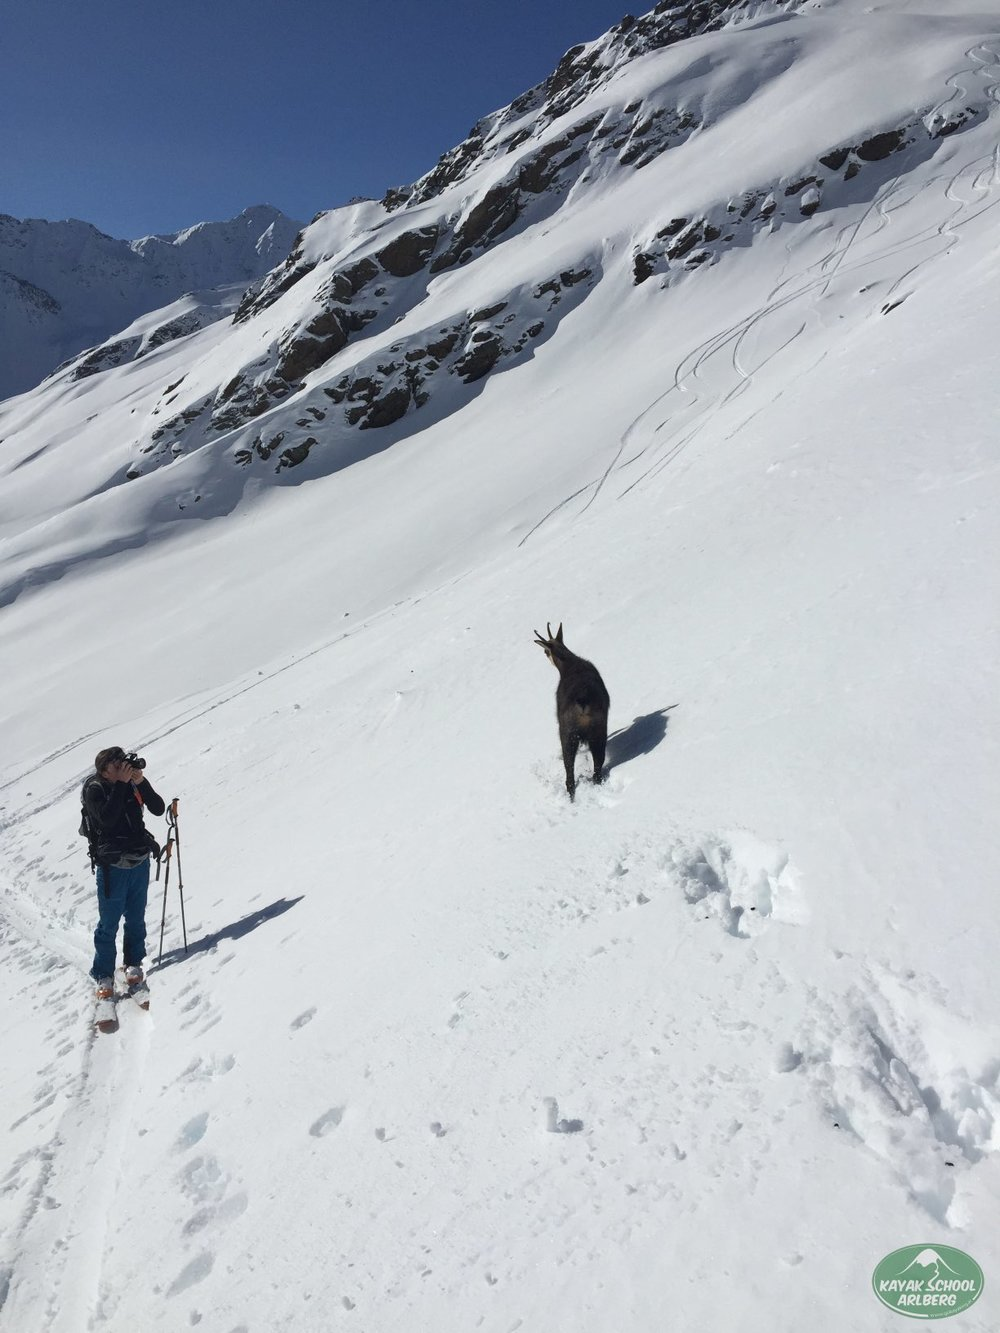 Winter-Skiing-Arlberg-Part-1-11.jpg